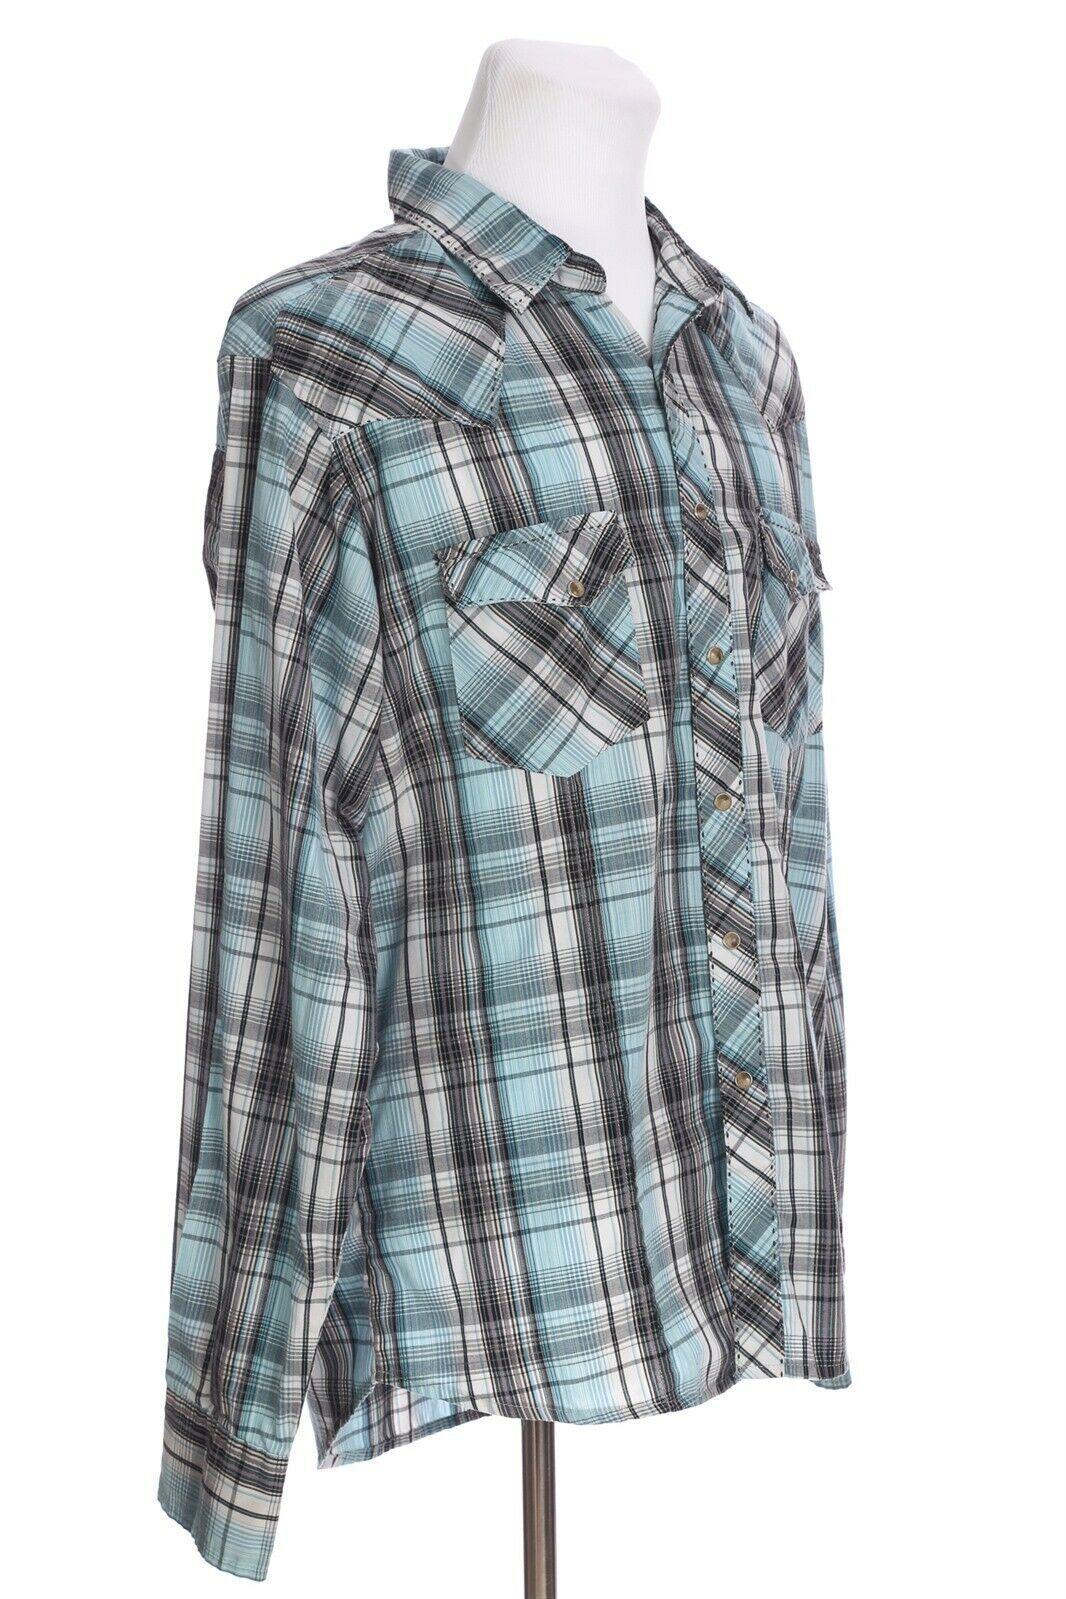 VTG Wrangler Plaid Cat Eye Pearl Snap Western Shirt Large Slim Fit Blue Black